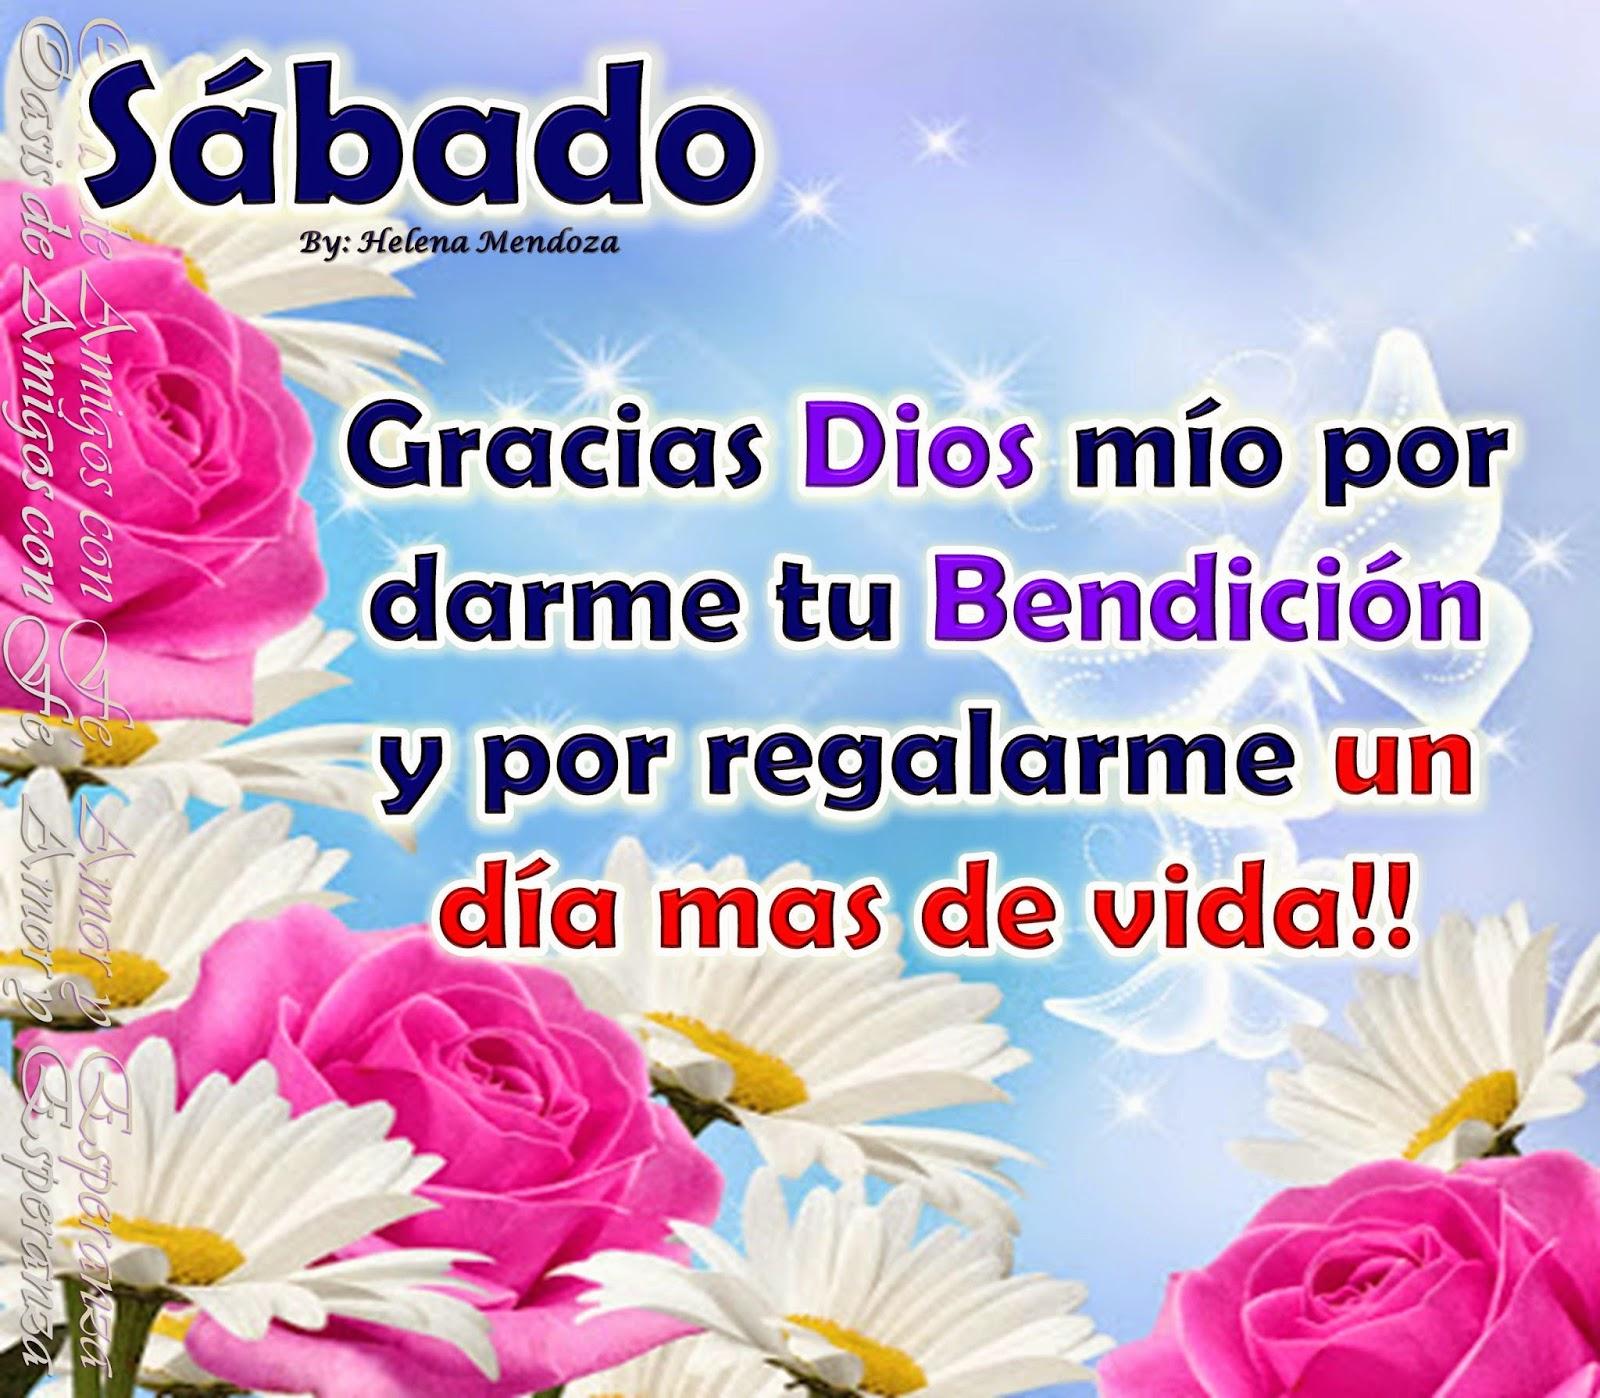 Feliz Sabado Frases Www Miifotos Com